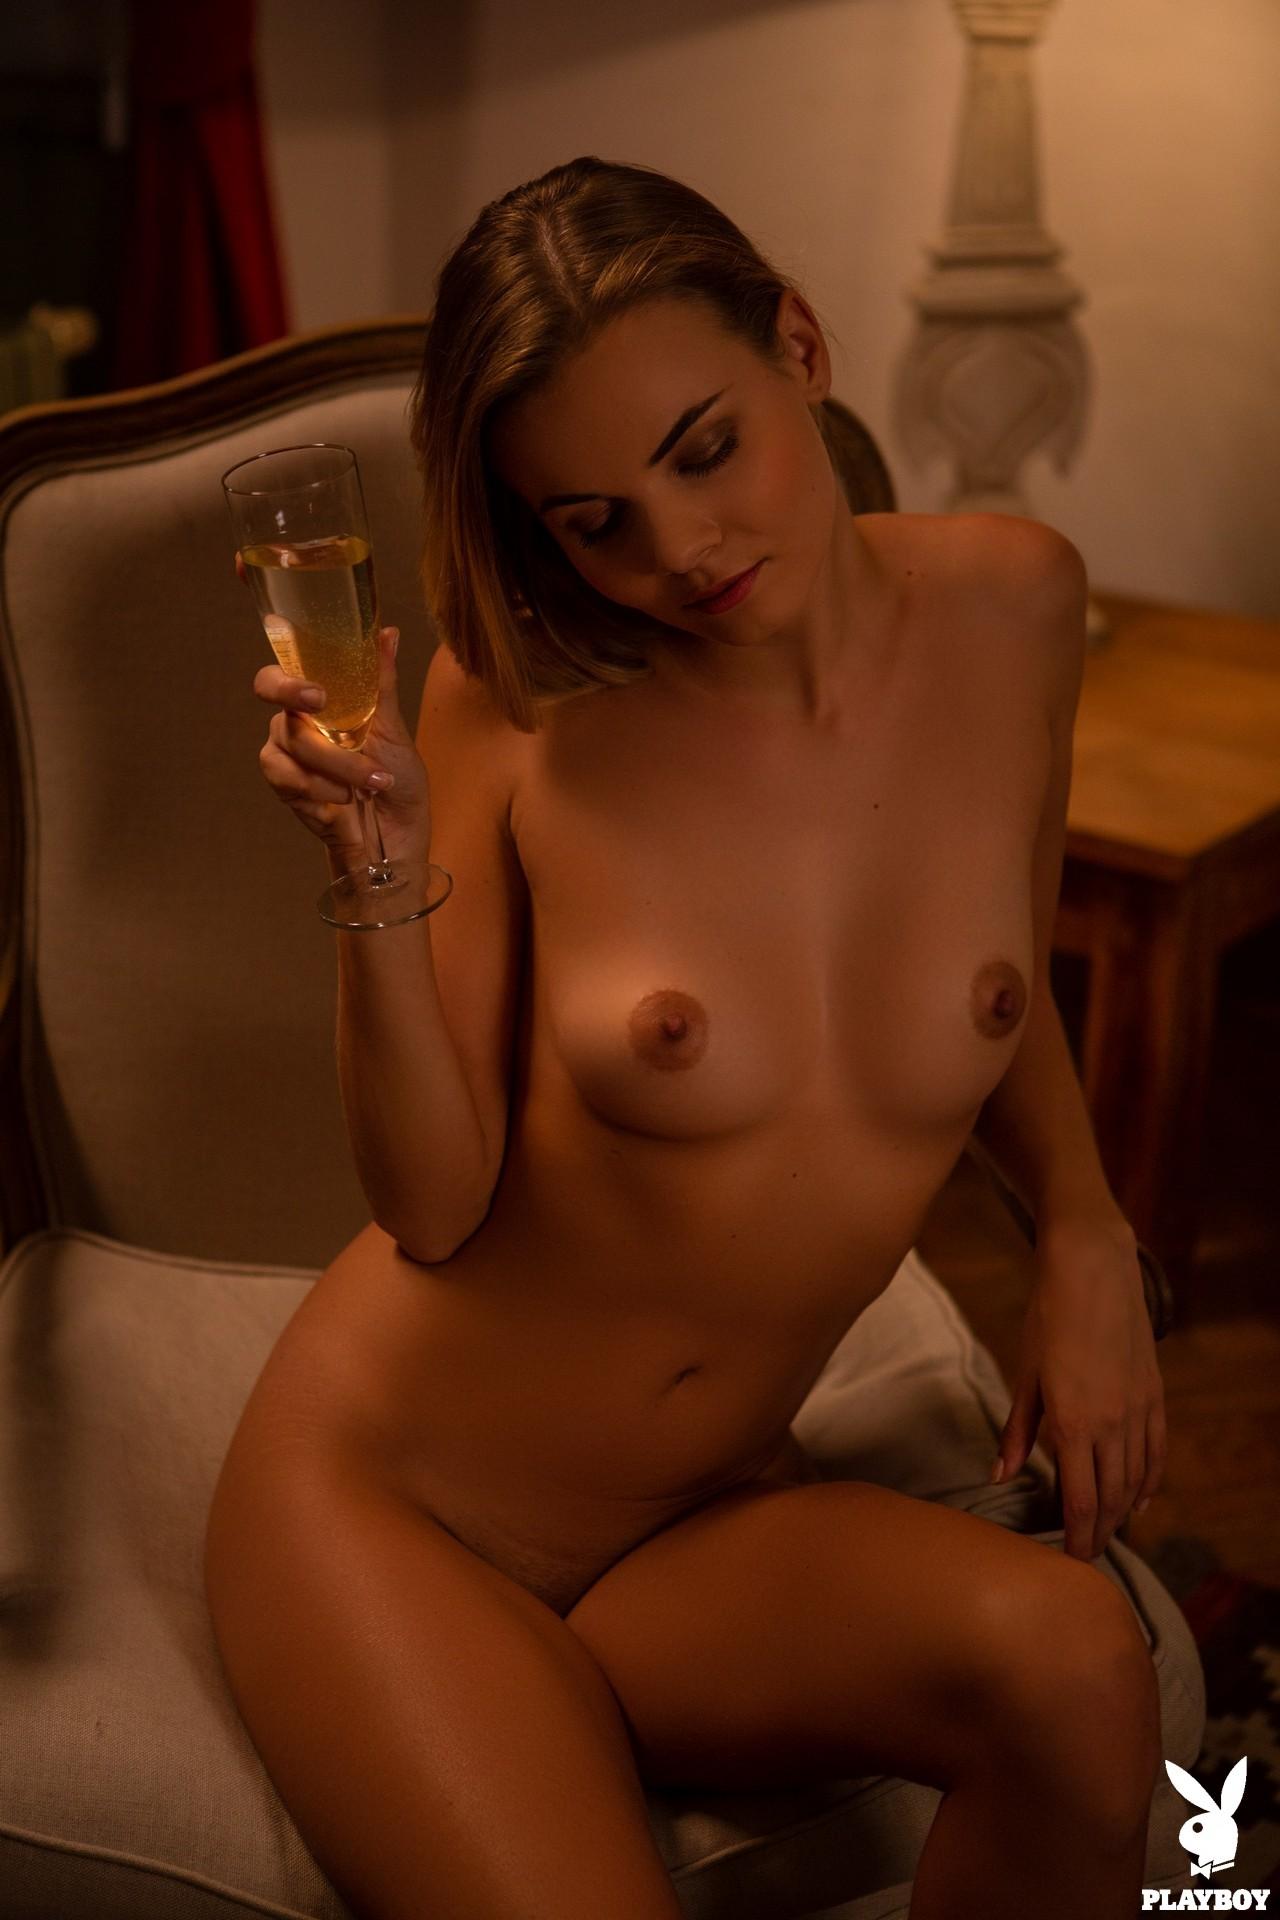 Kate Jones in Exquisite Allure - Playboy Plus 37